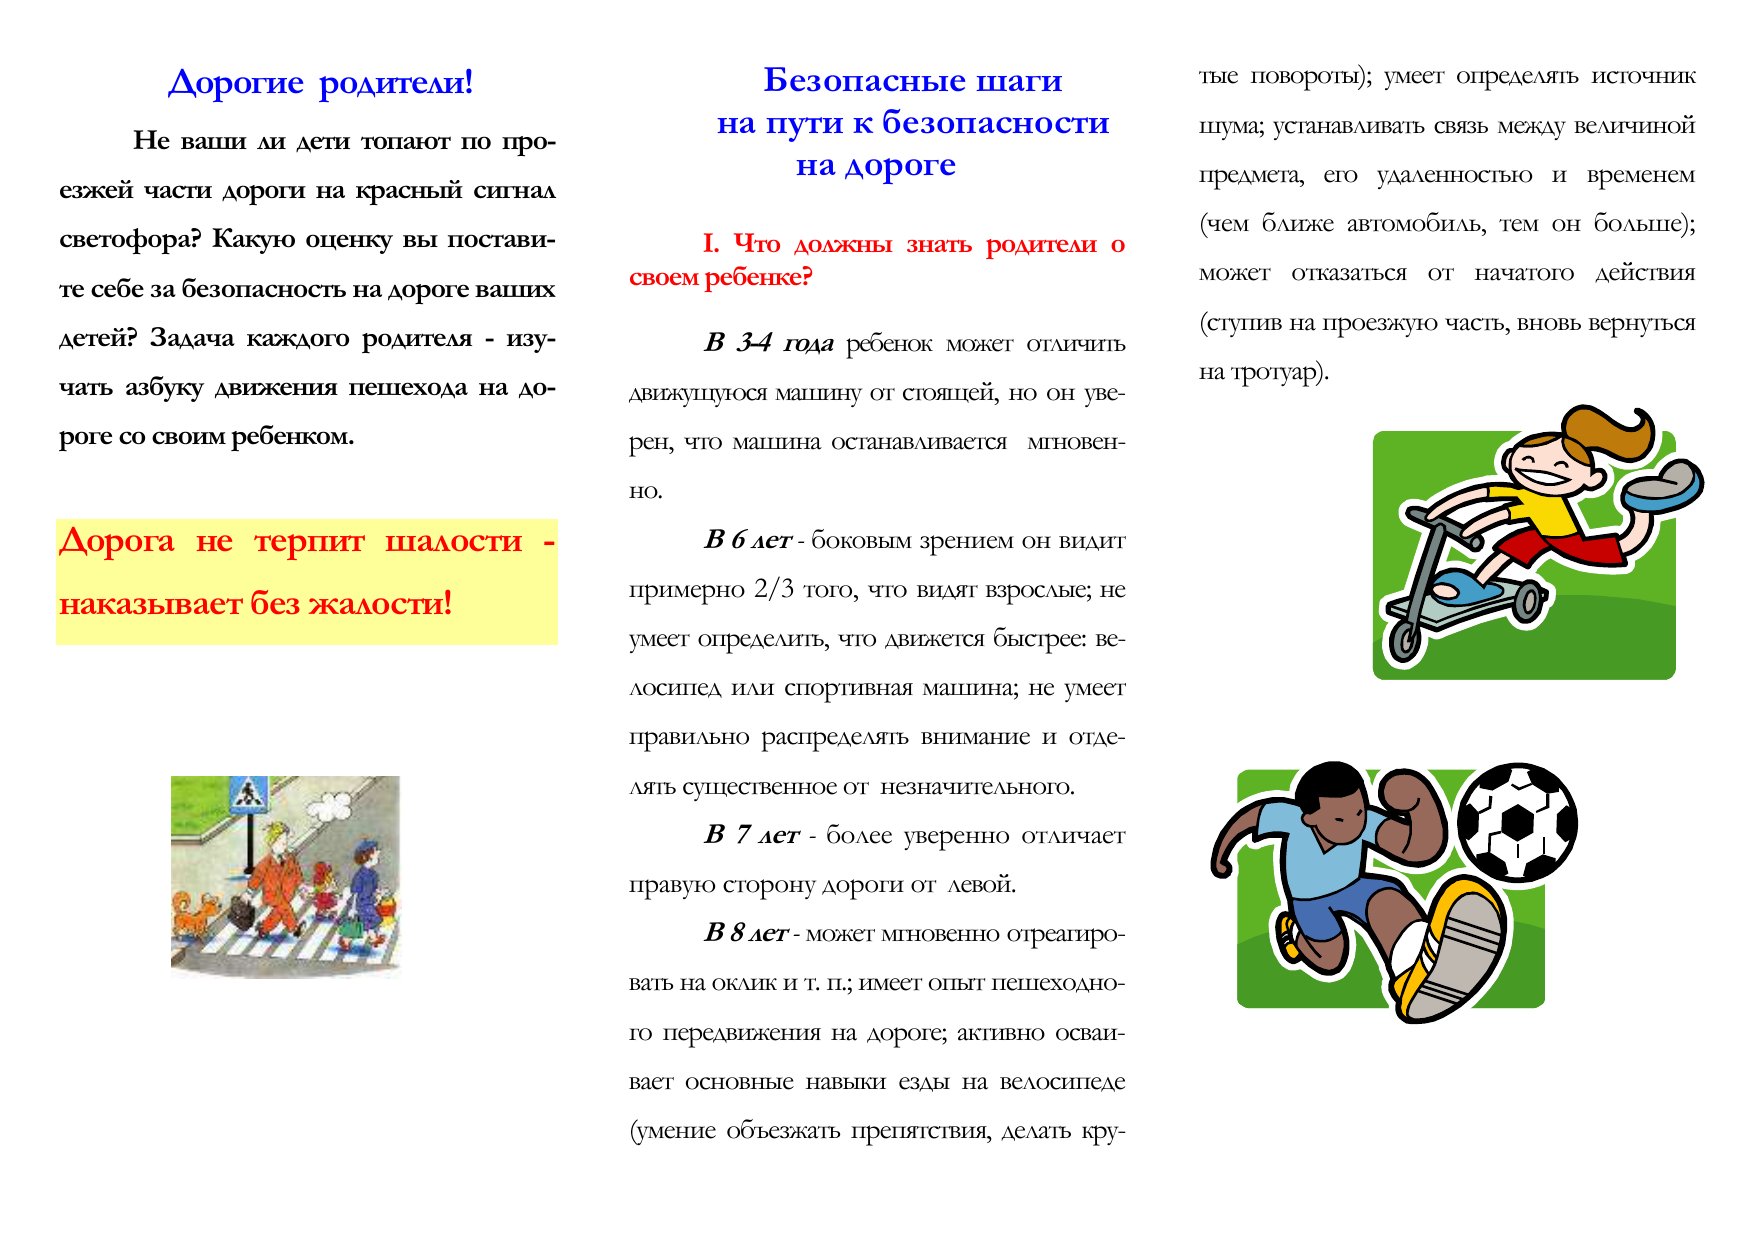 http://s2.docme.ru/store/data/000386173_1-4832dc88d77c28df29c7ed21eb715451.png